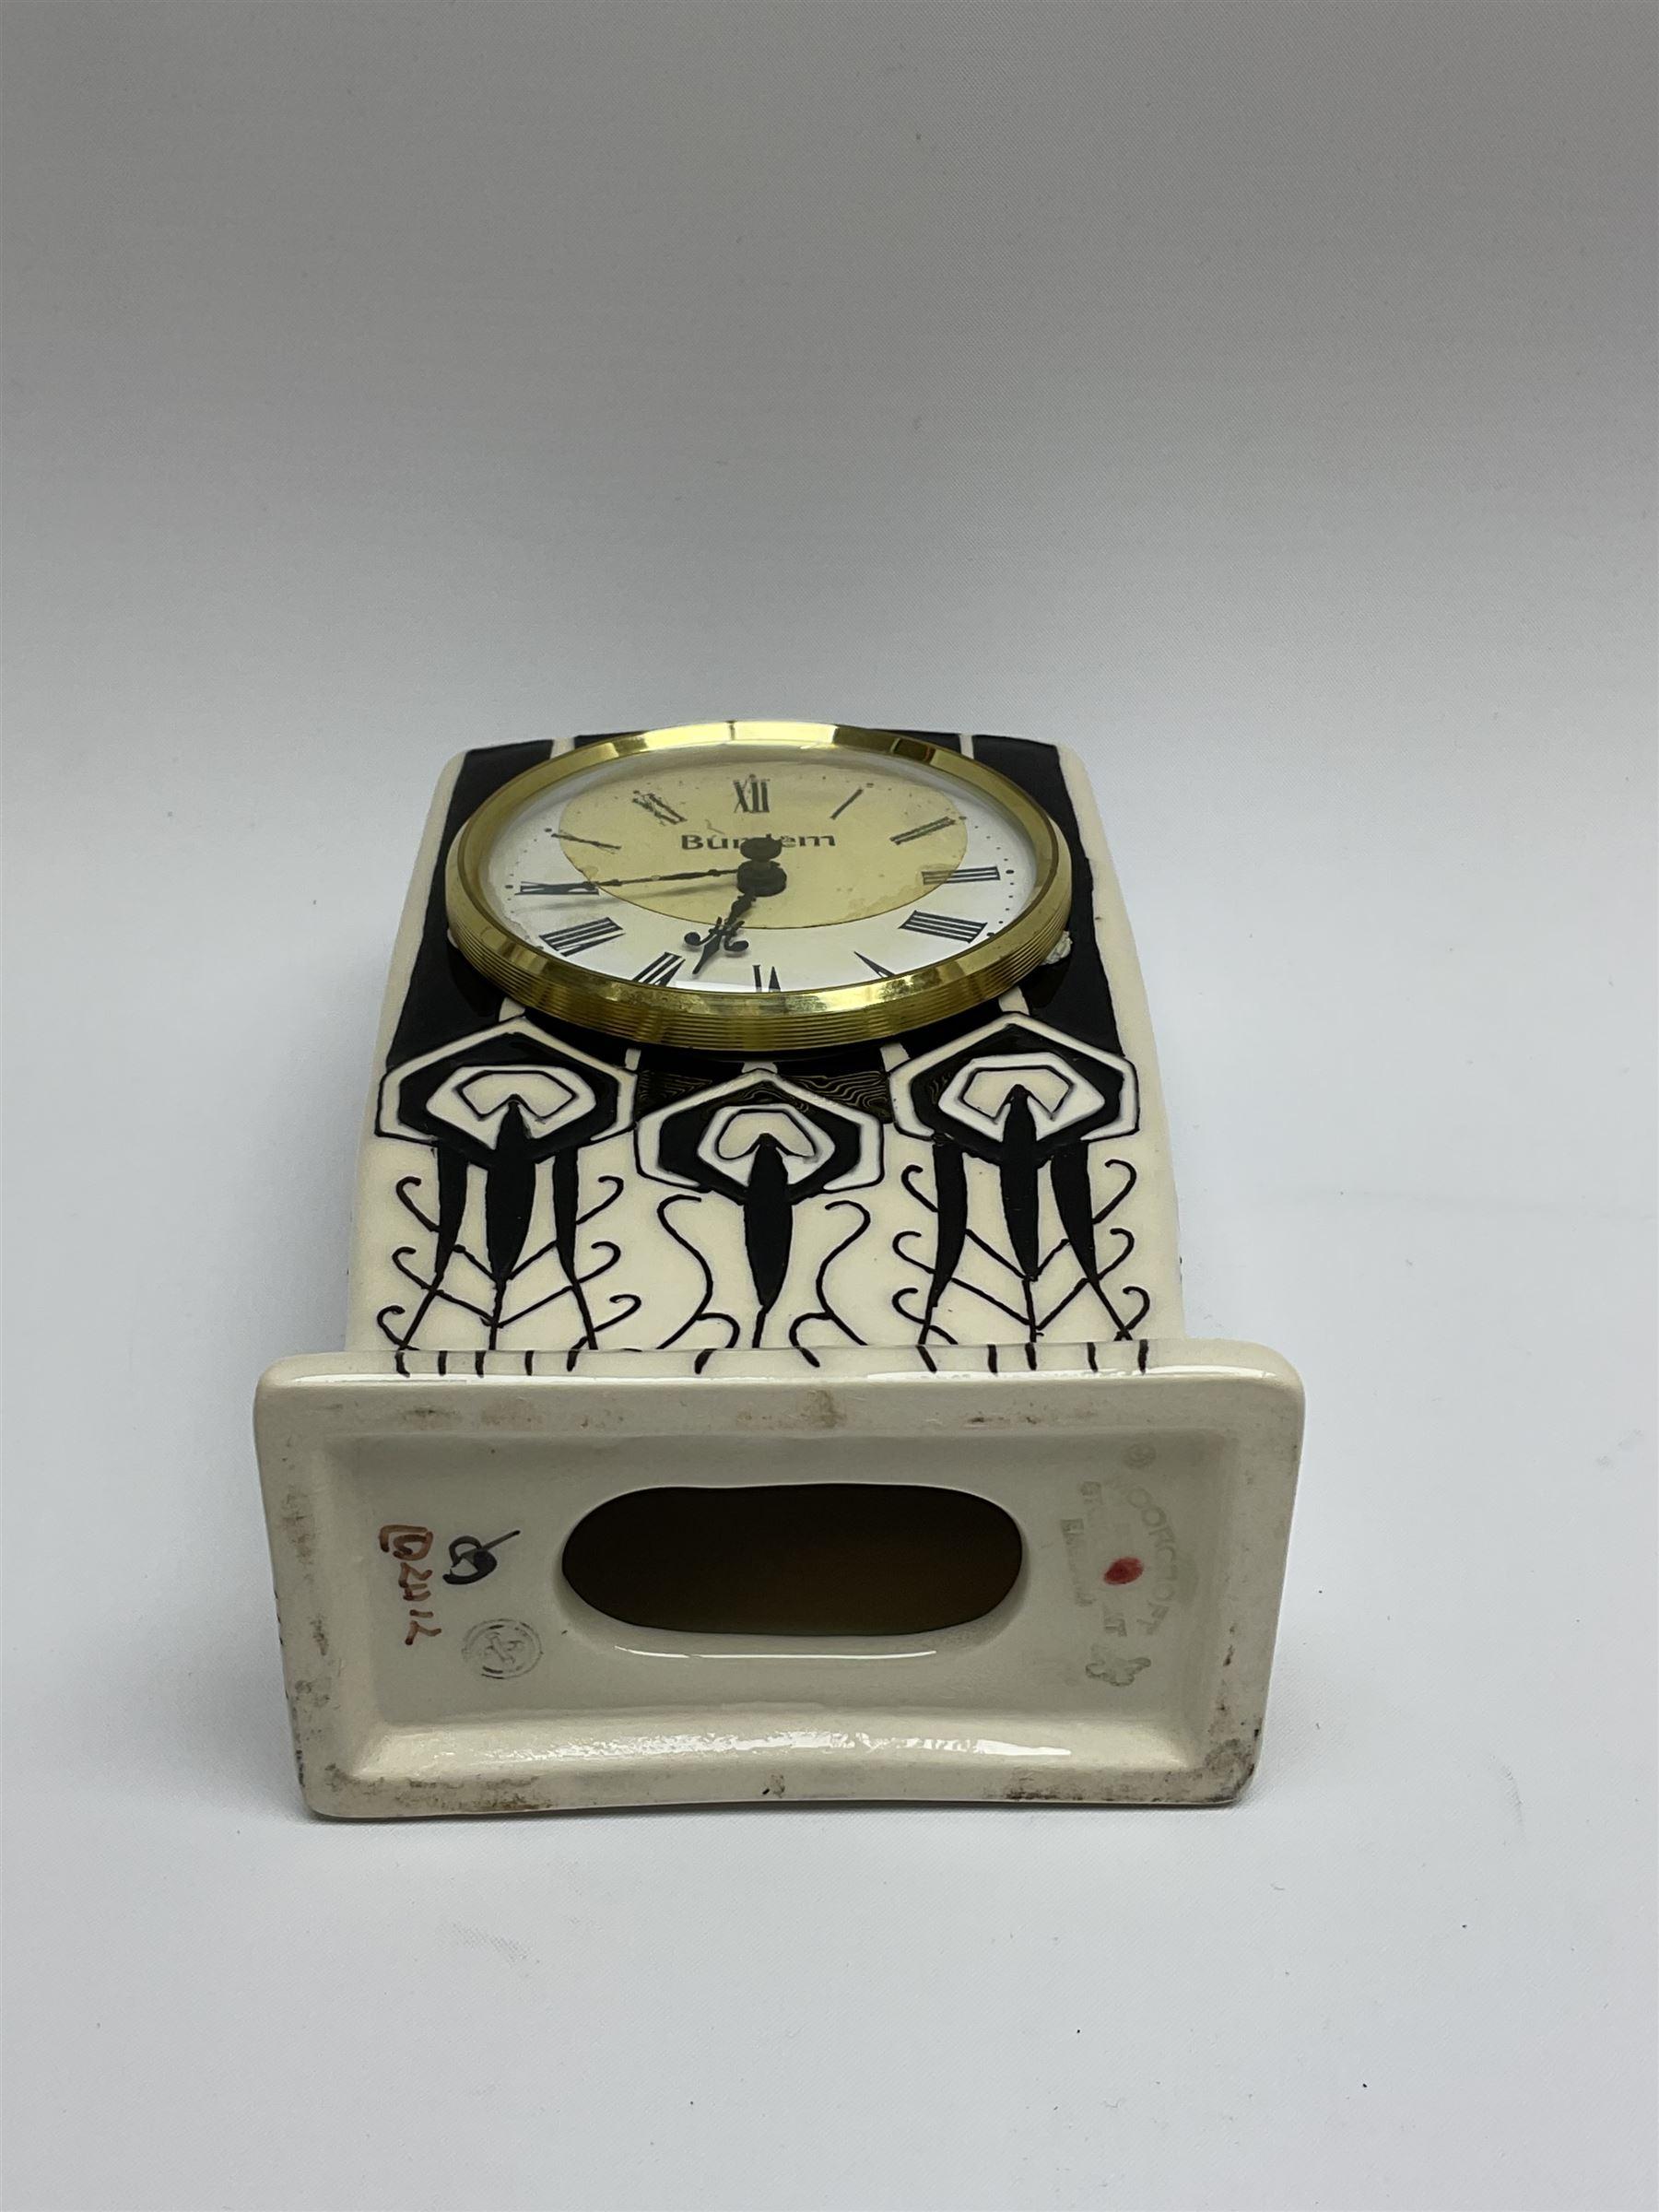 A Moorcroft mantle clock - Image 5 of 5